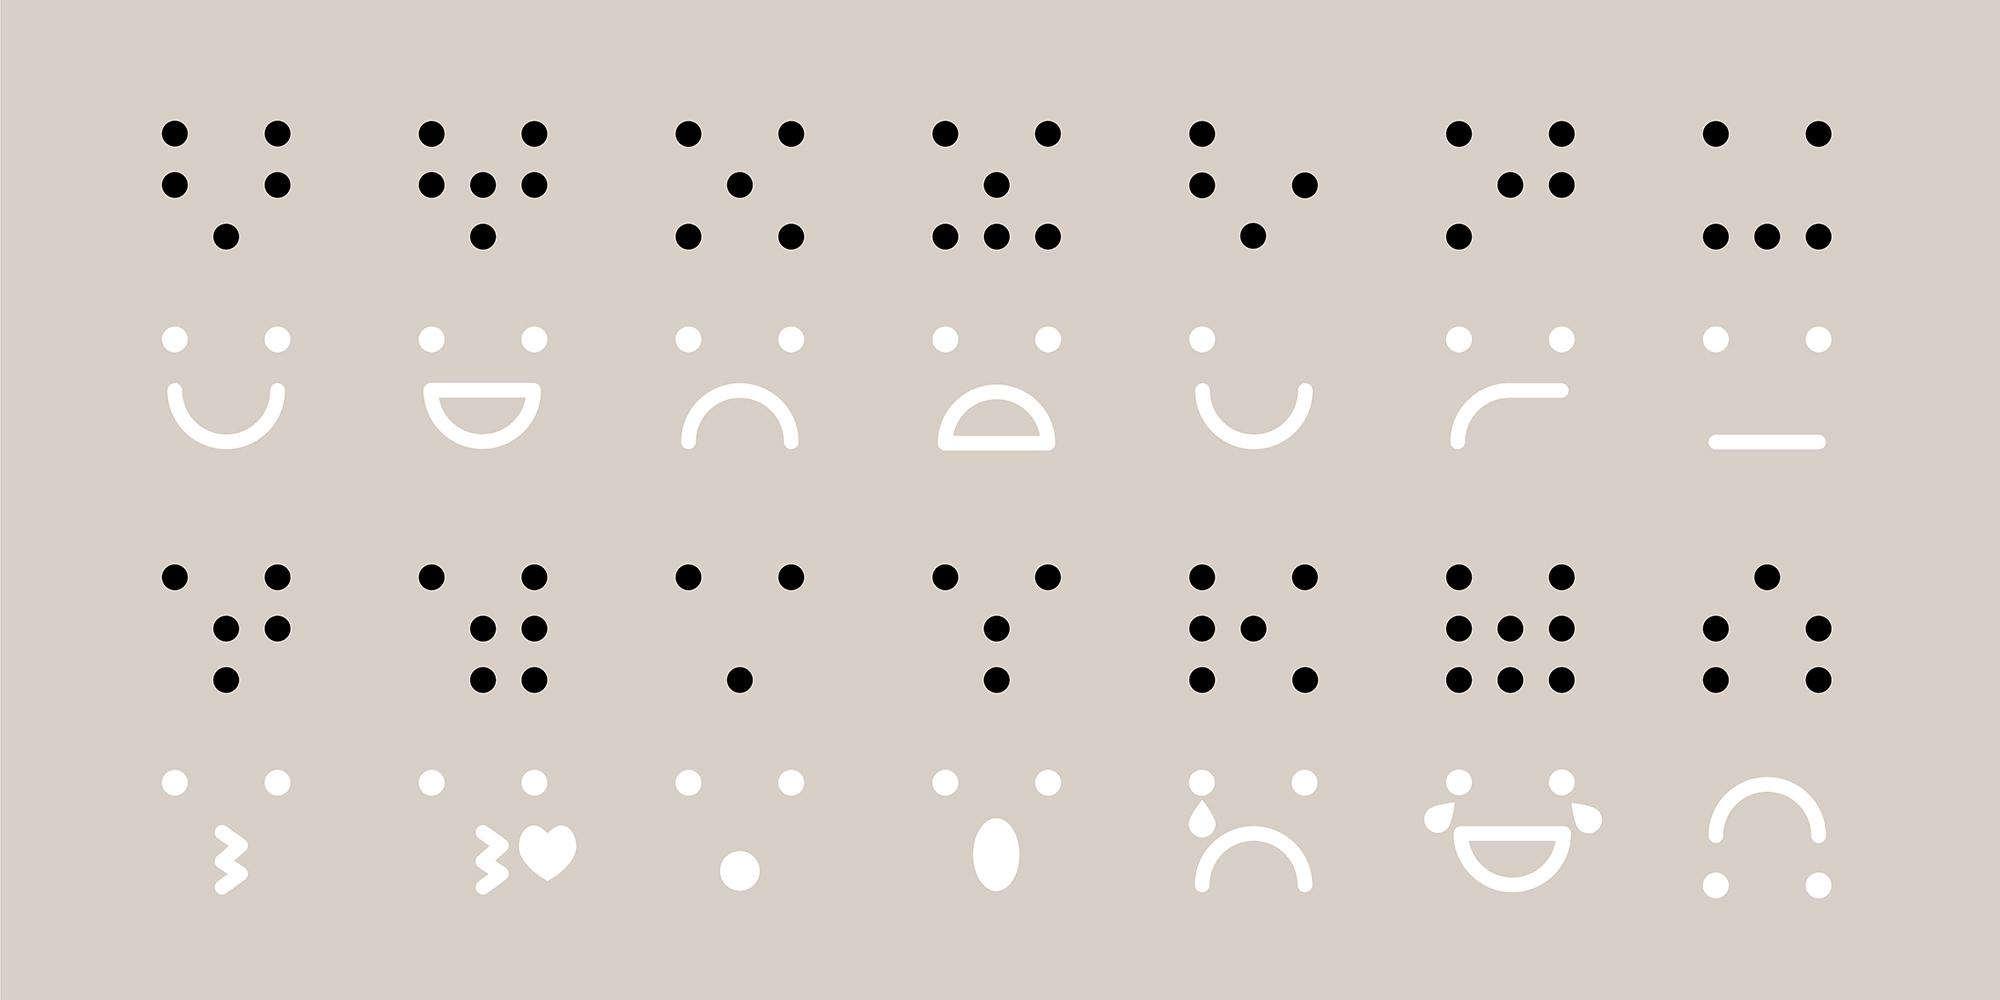 Braille Dingbats Poster Kleur 2